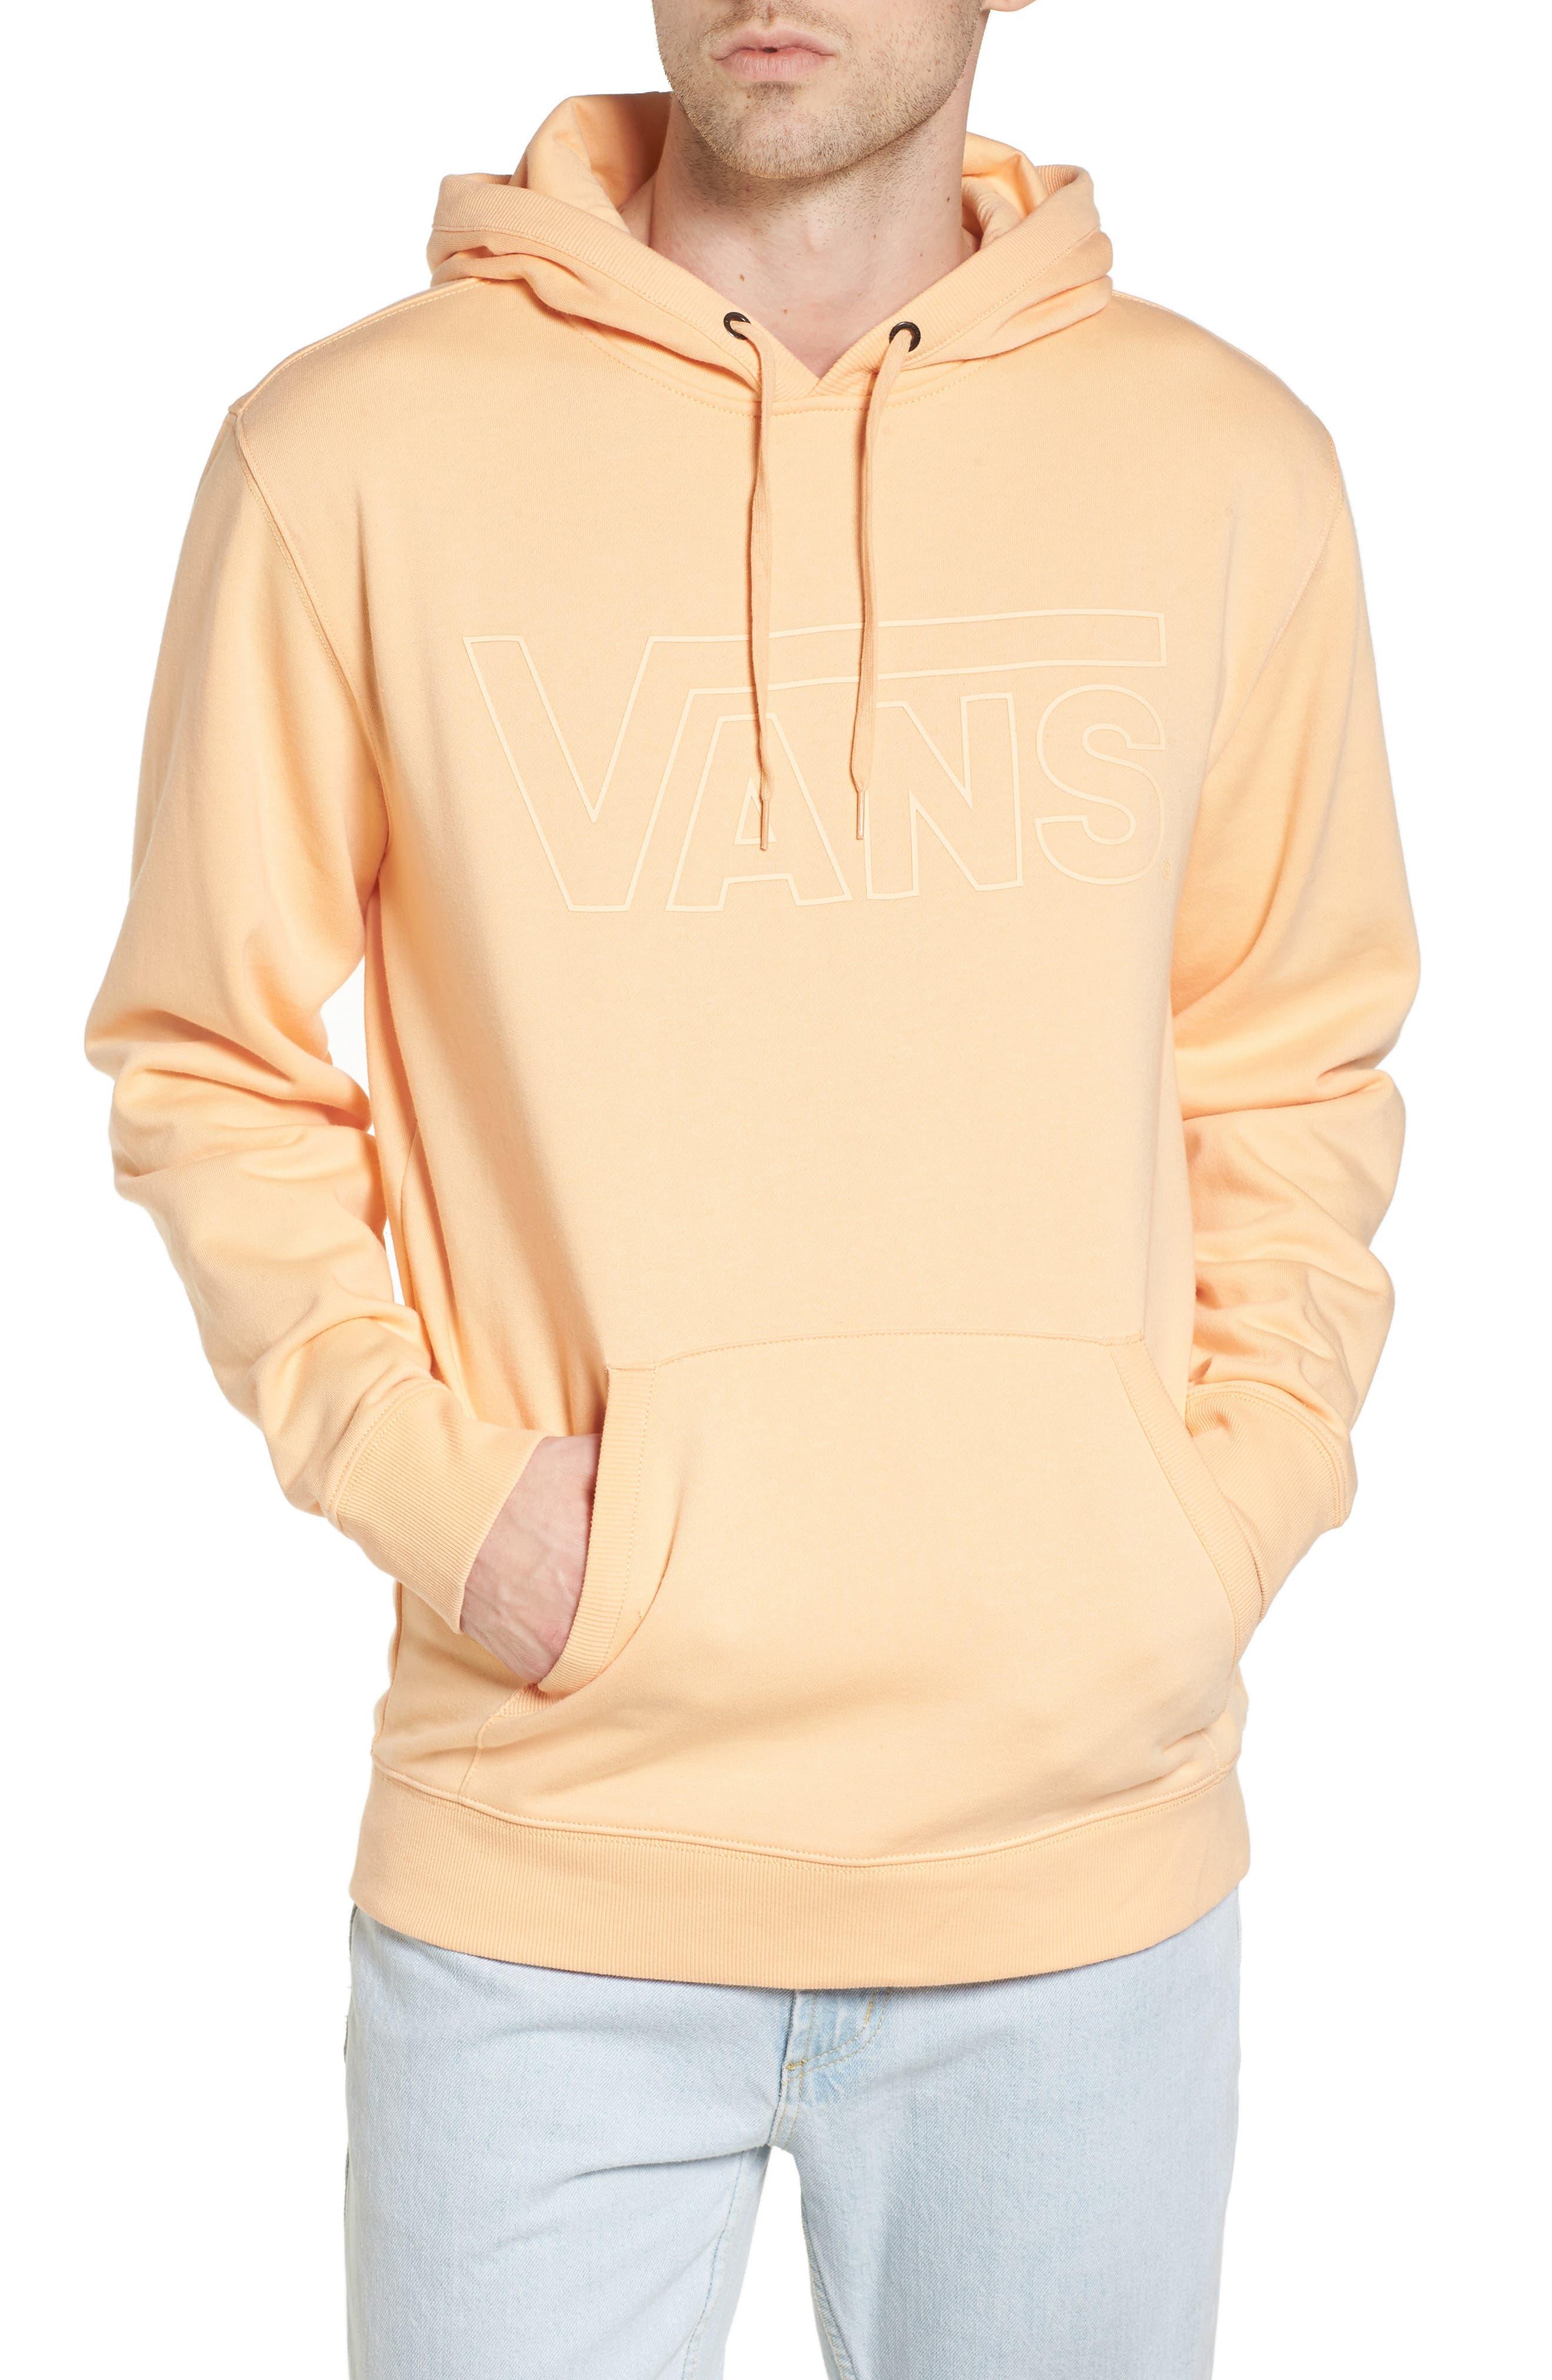 Classic Hoodie Sweatshirt,                             Main thumbnail 1, color,                             Apricot Ice